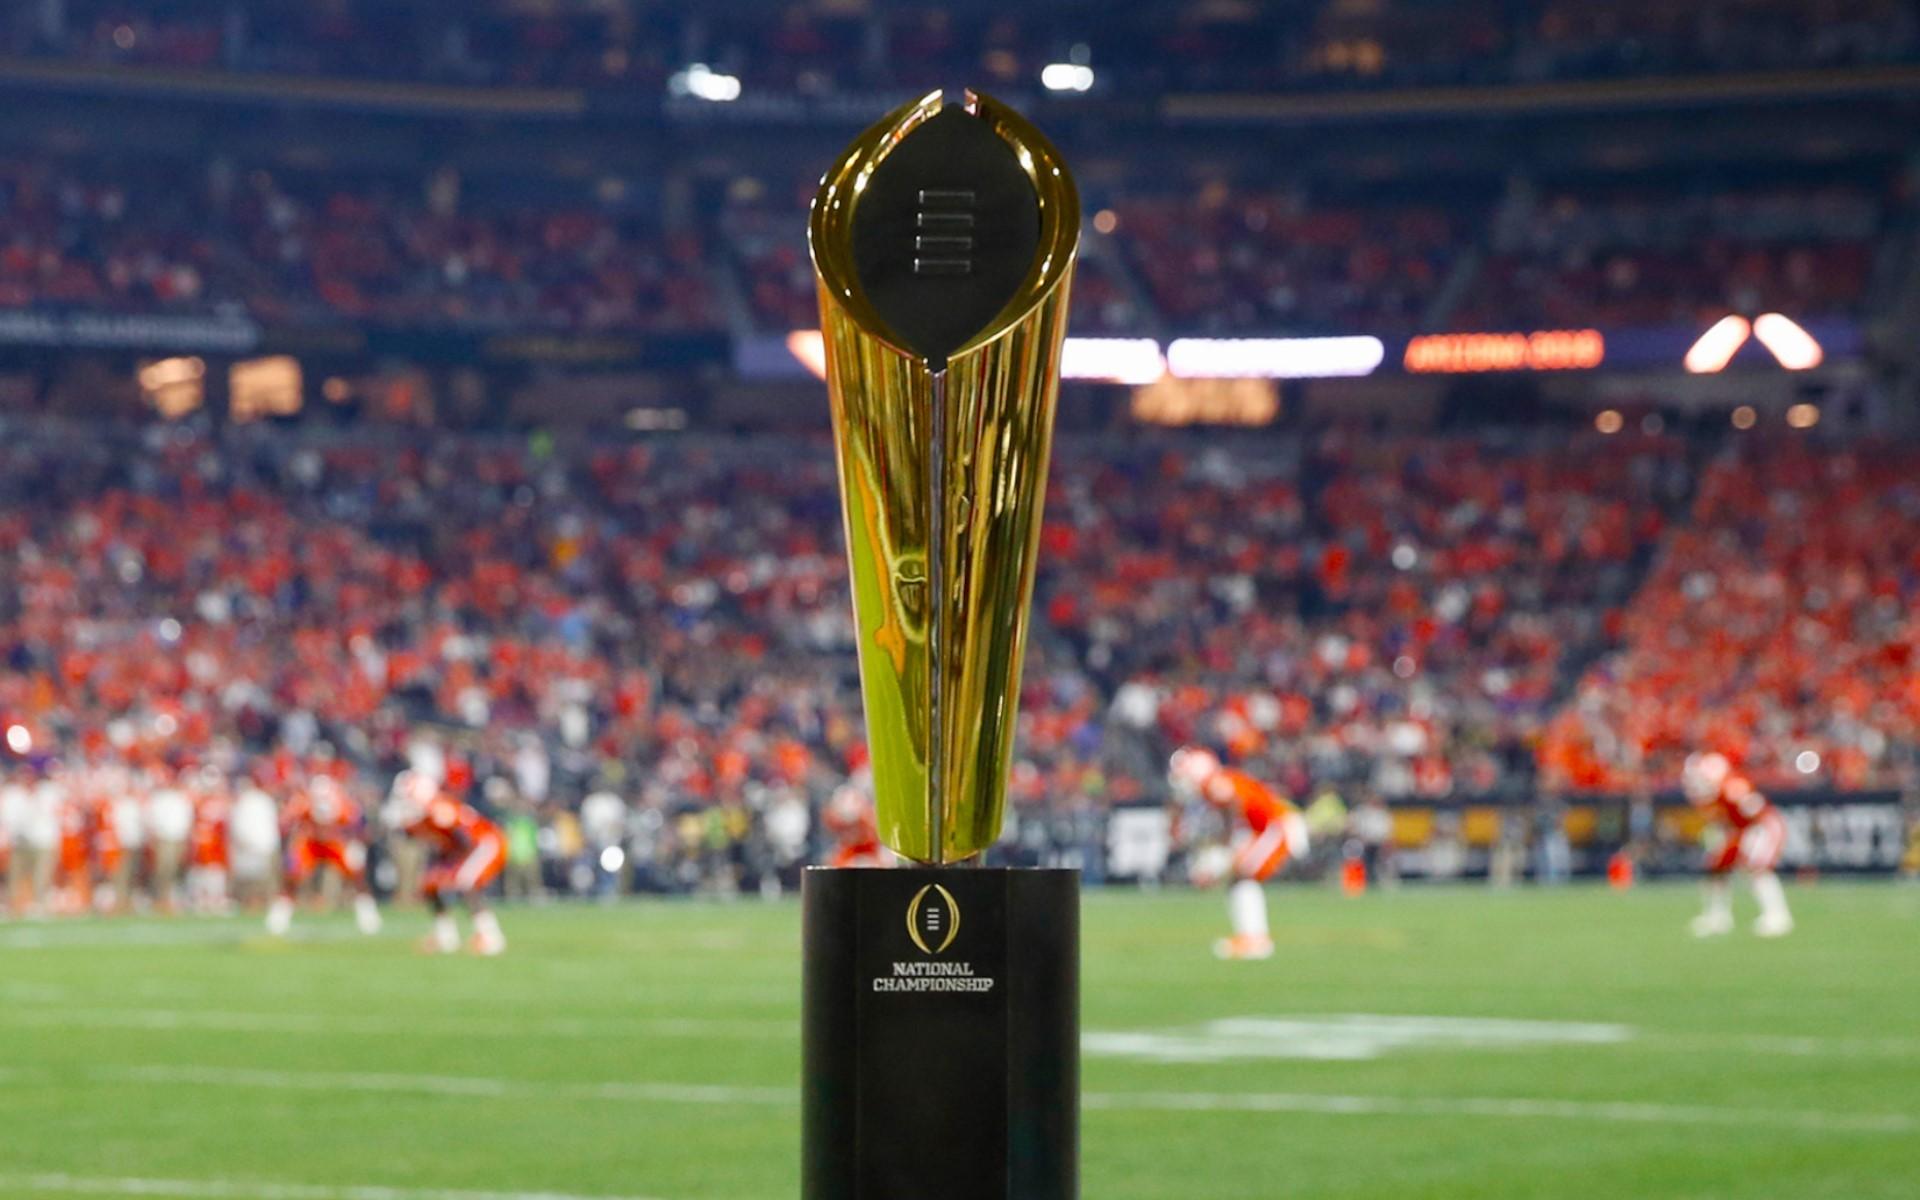 NCAAカレッジフットボール優勝杯